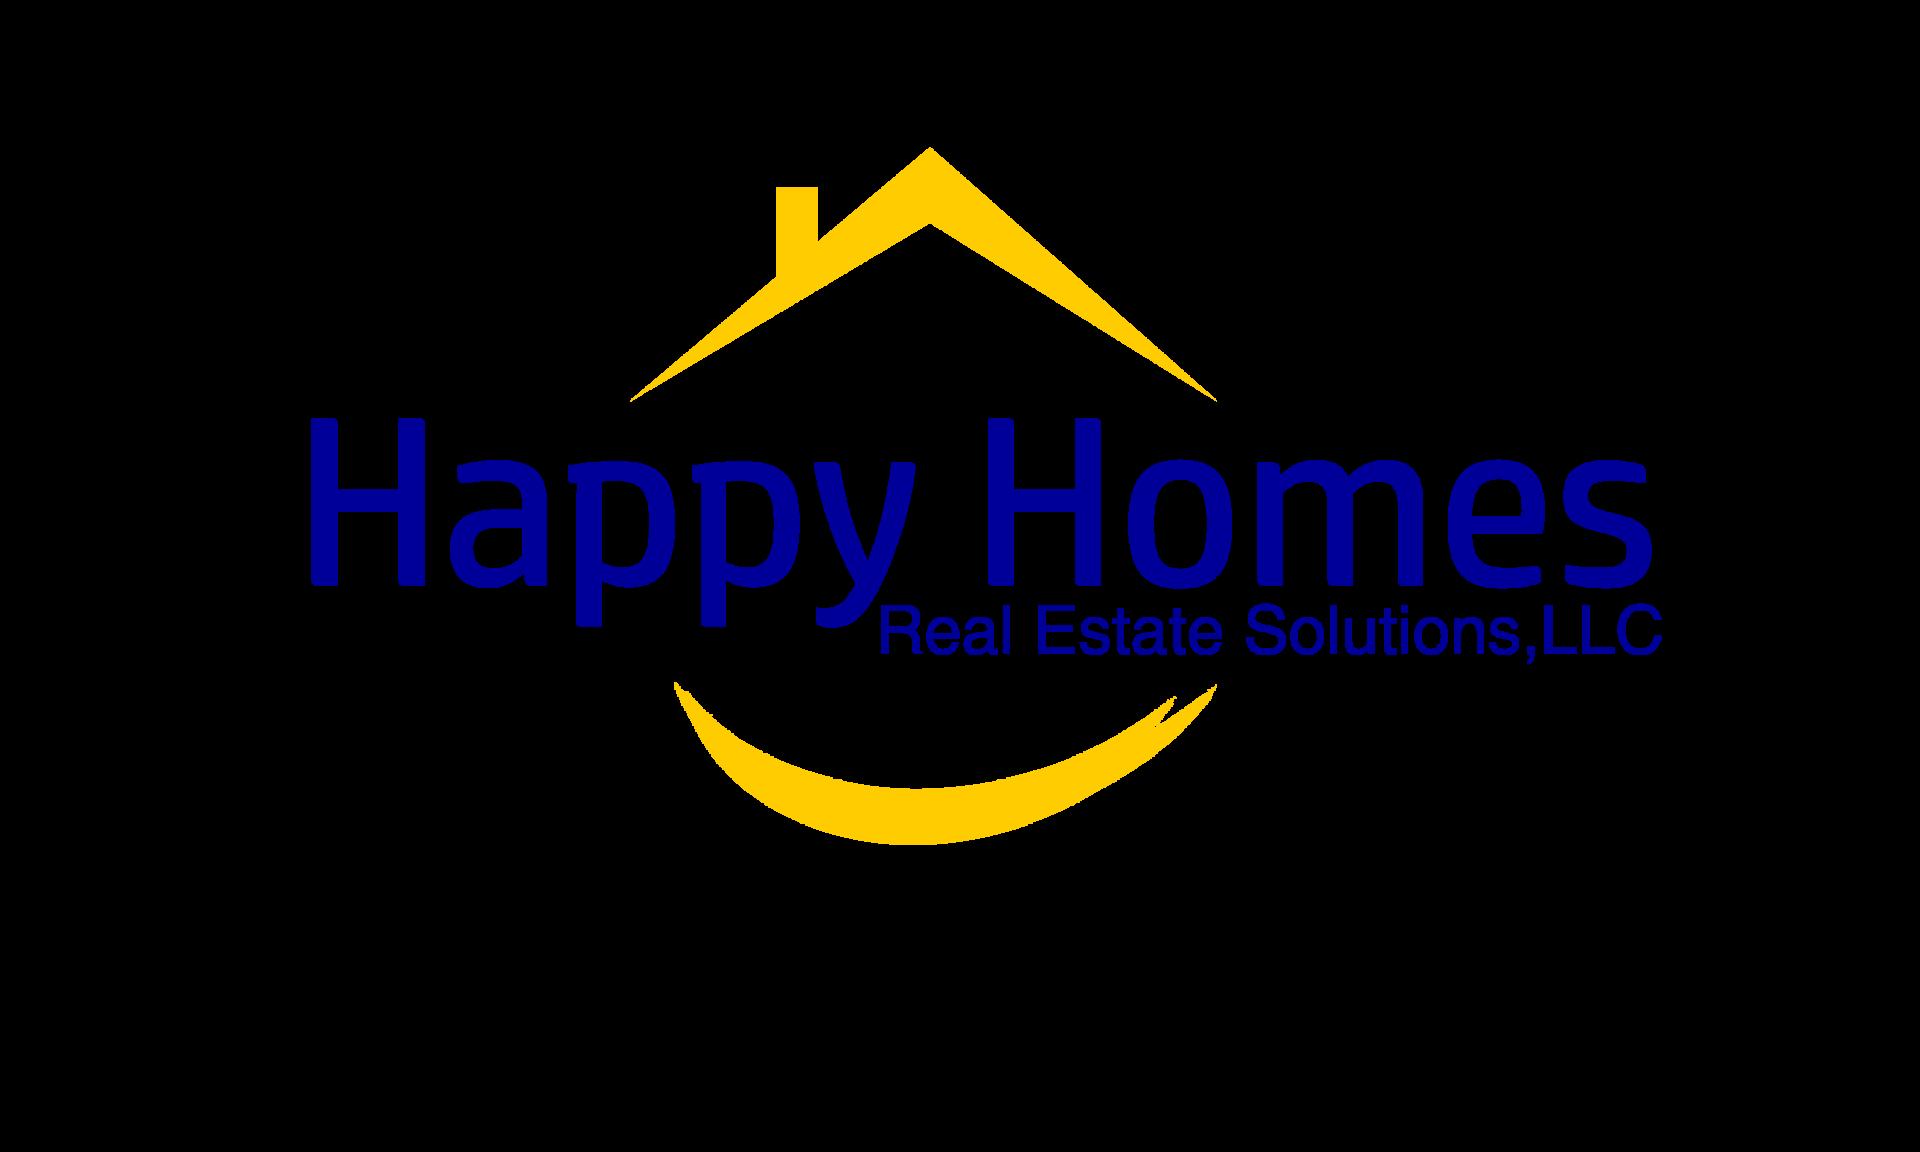 Happy Homes Real Estate Solutions, LLC  logo